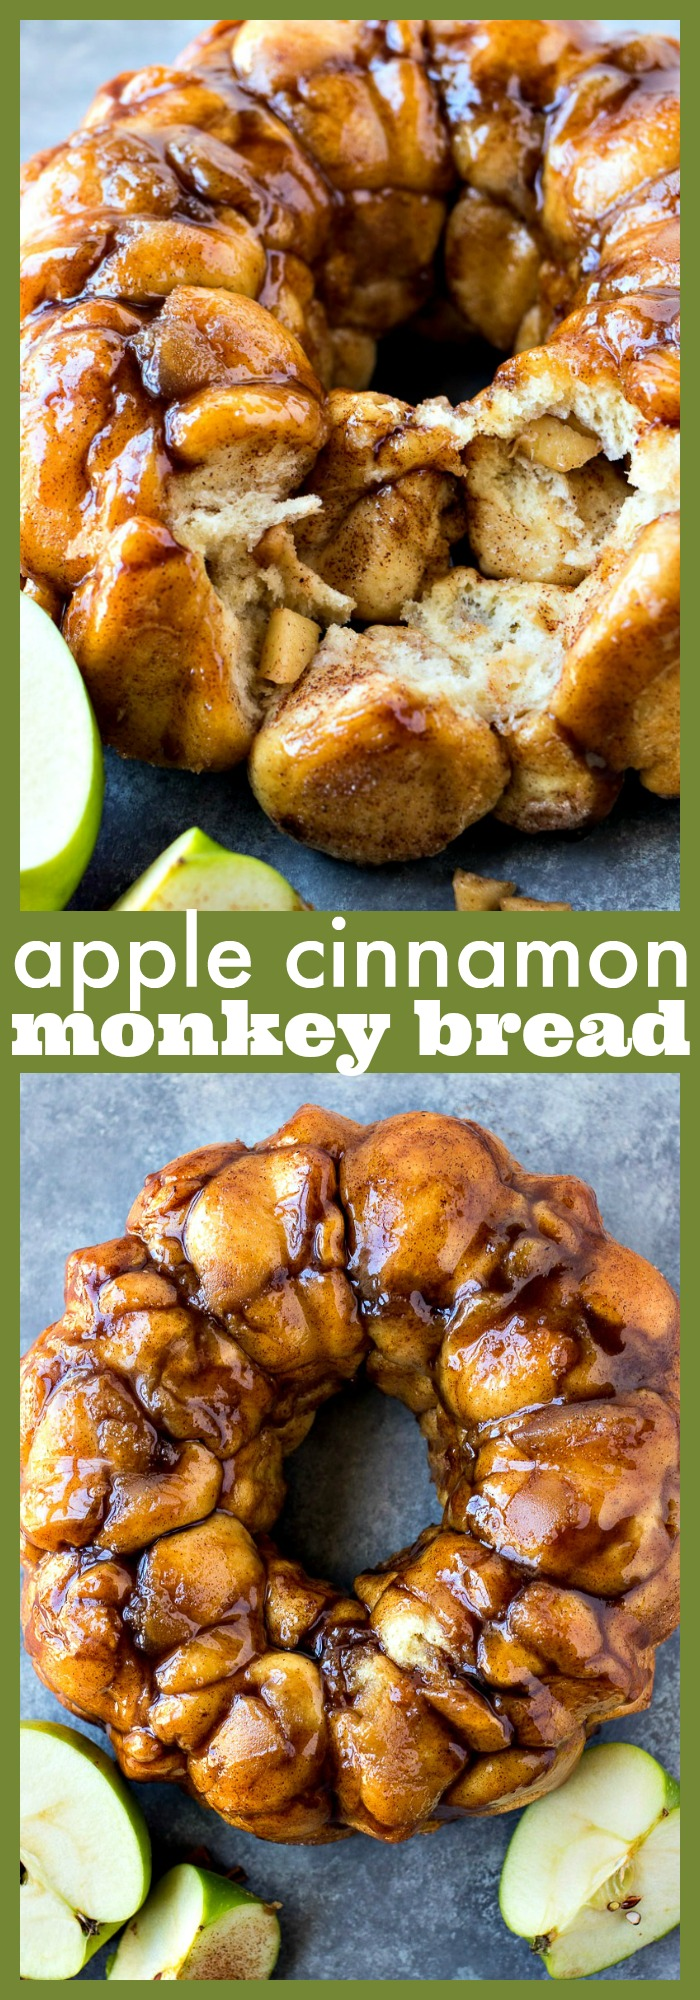 Apple Cinnamon Monkey Bread  photo collage